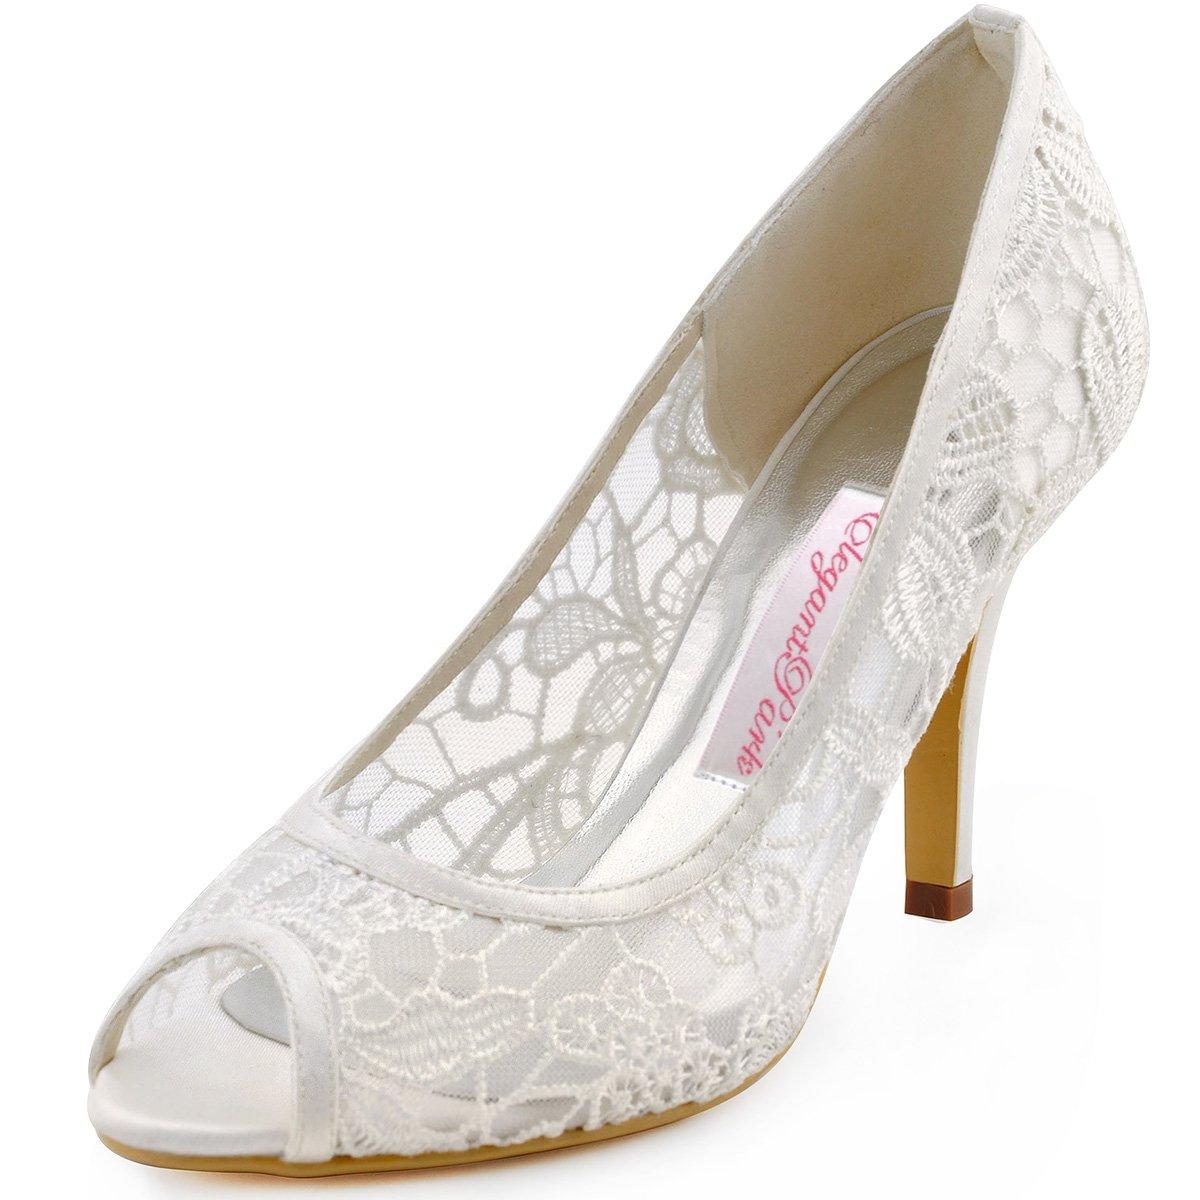 ElegantPark Ivory Women Peep Toe High Heel Pumps Vintage Lace Wedding Dress Shoes 0